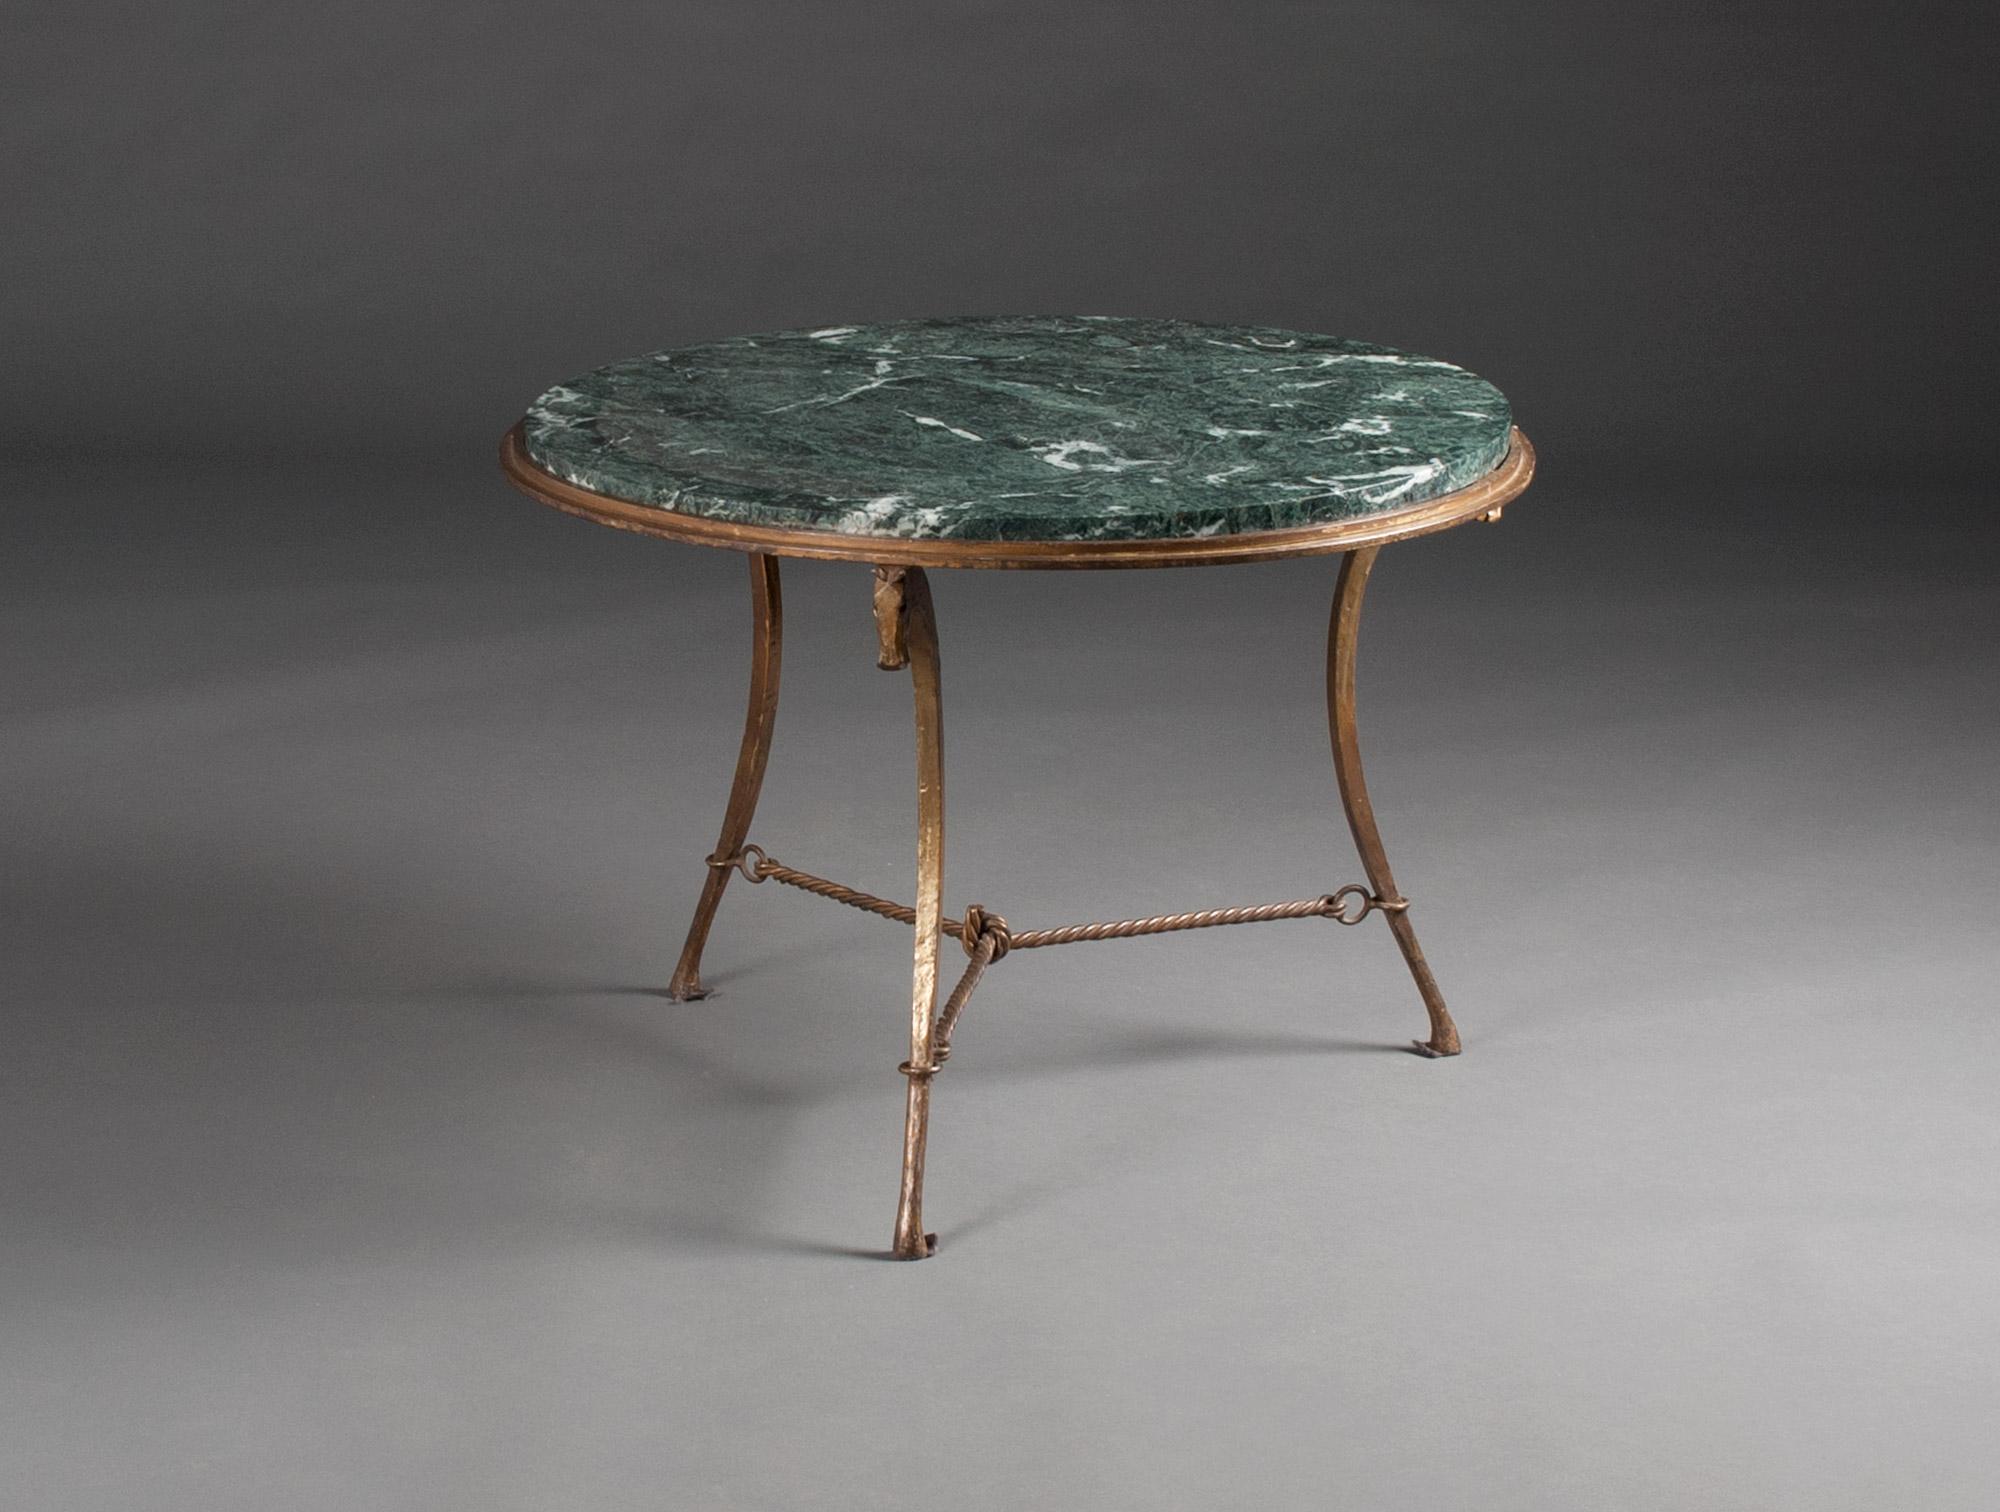 Super Pedestal Wrought Iron And Slate Soubrier Rent Tables Desk Beatyapartments Chair Design Images Beatyapartmentscom